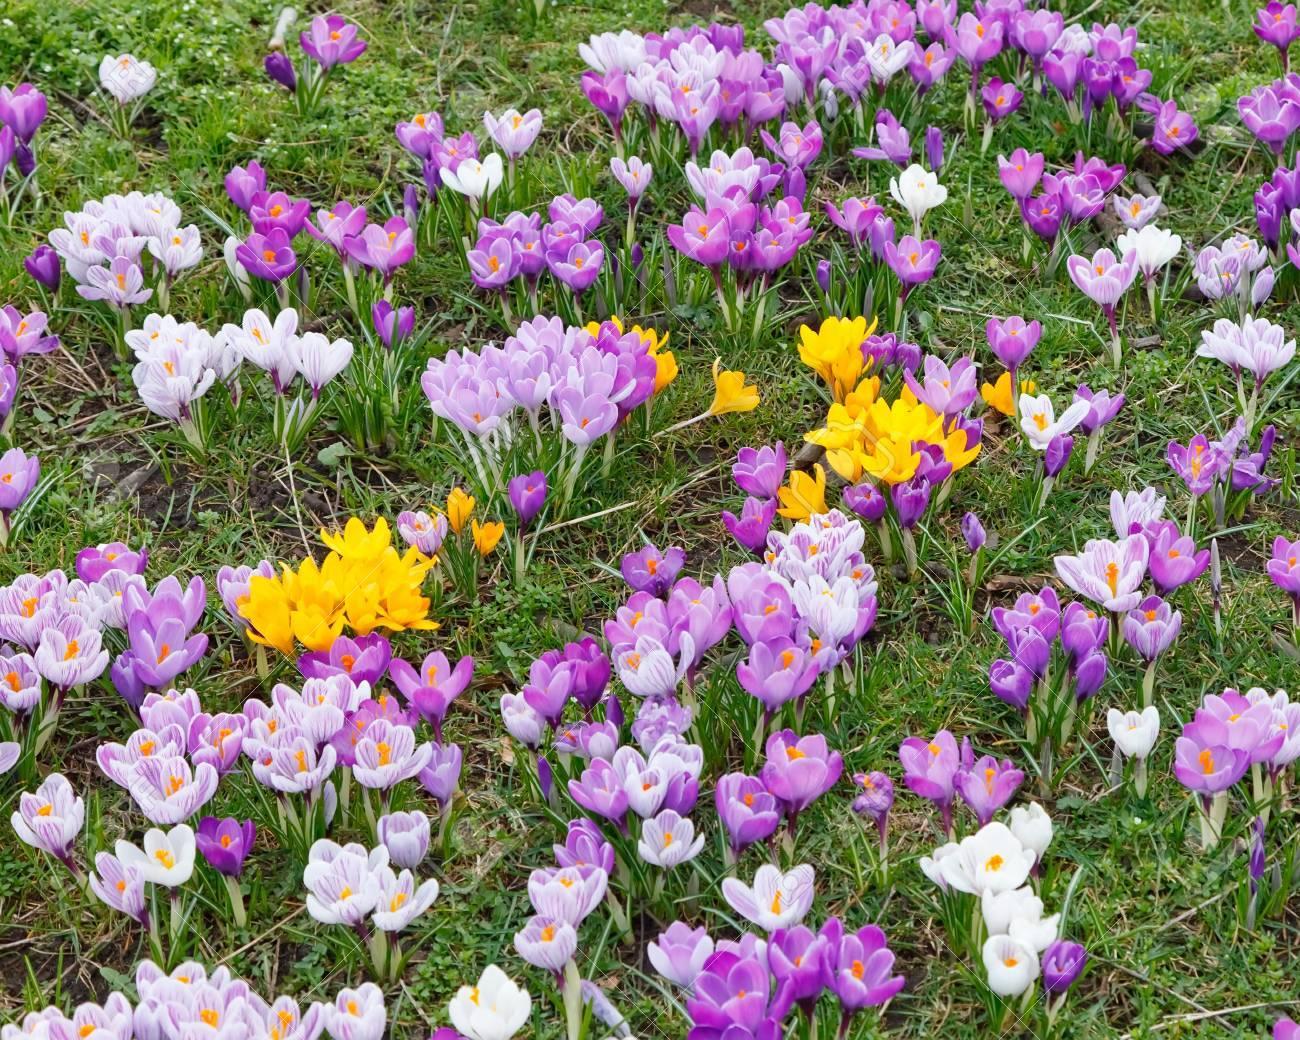 Wild Yellow Purple And White Crocus Flowers Stock Photo Picture